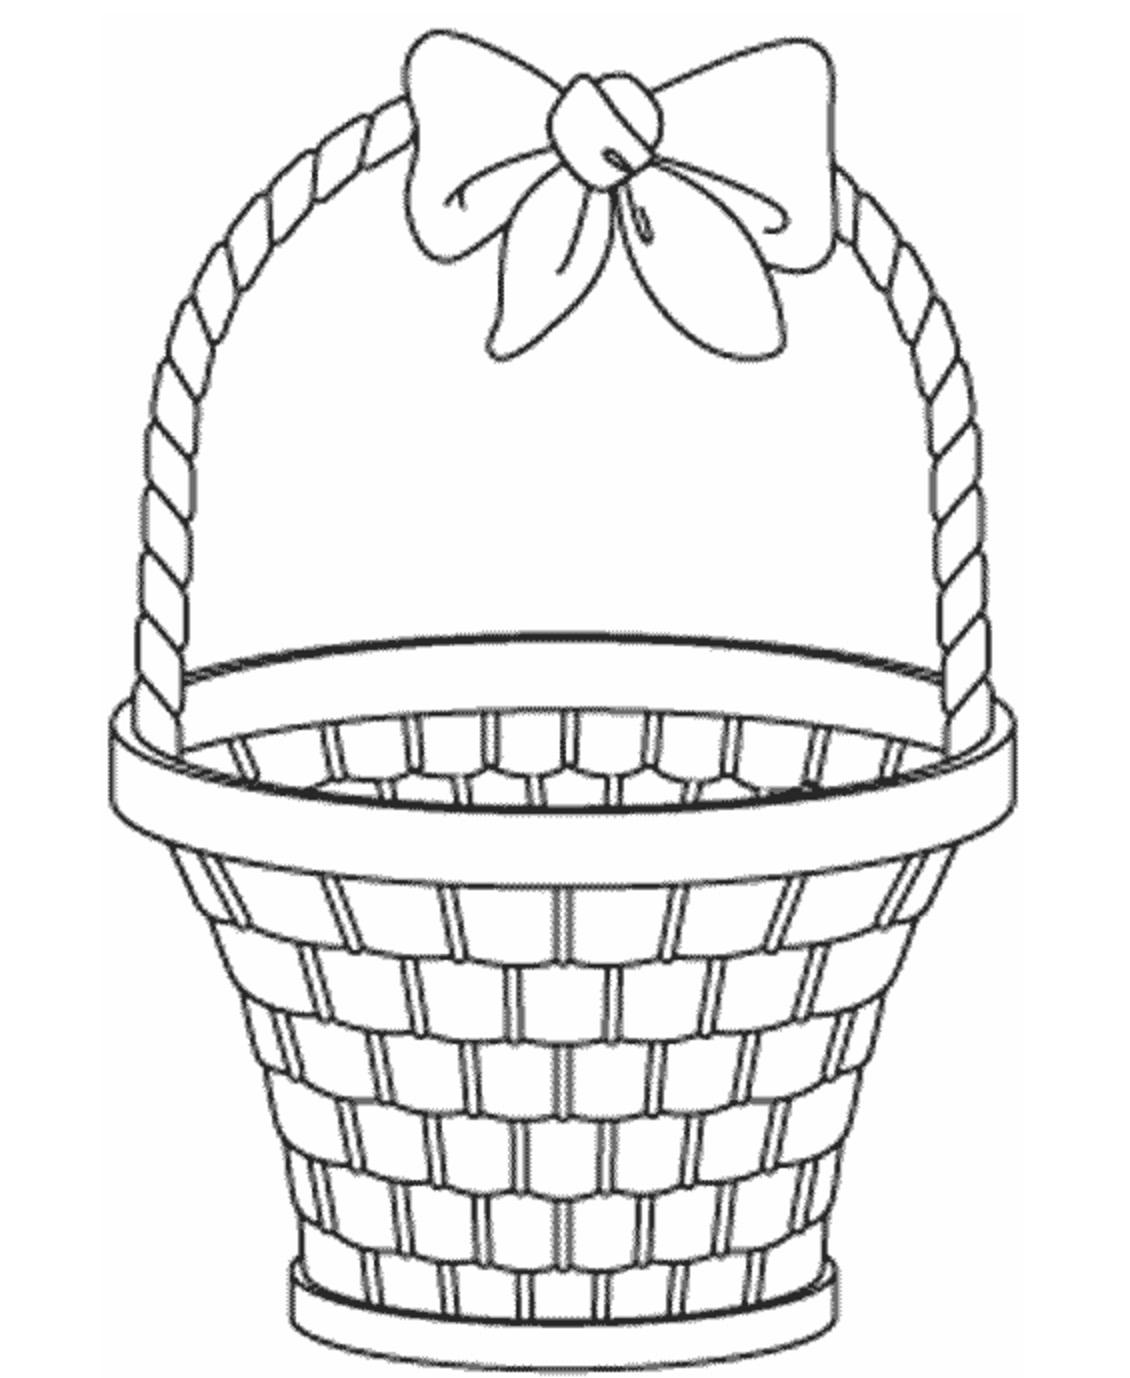 T Basket Drawing At Getdrawings